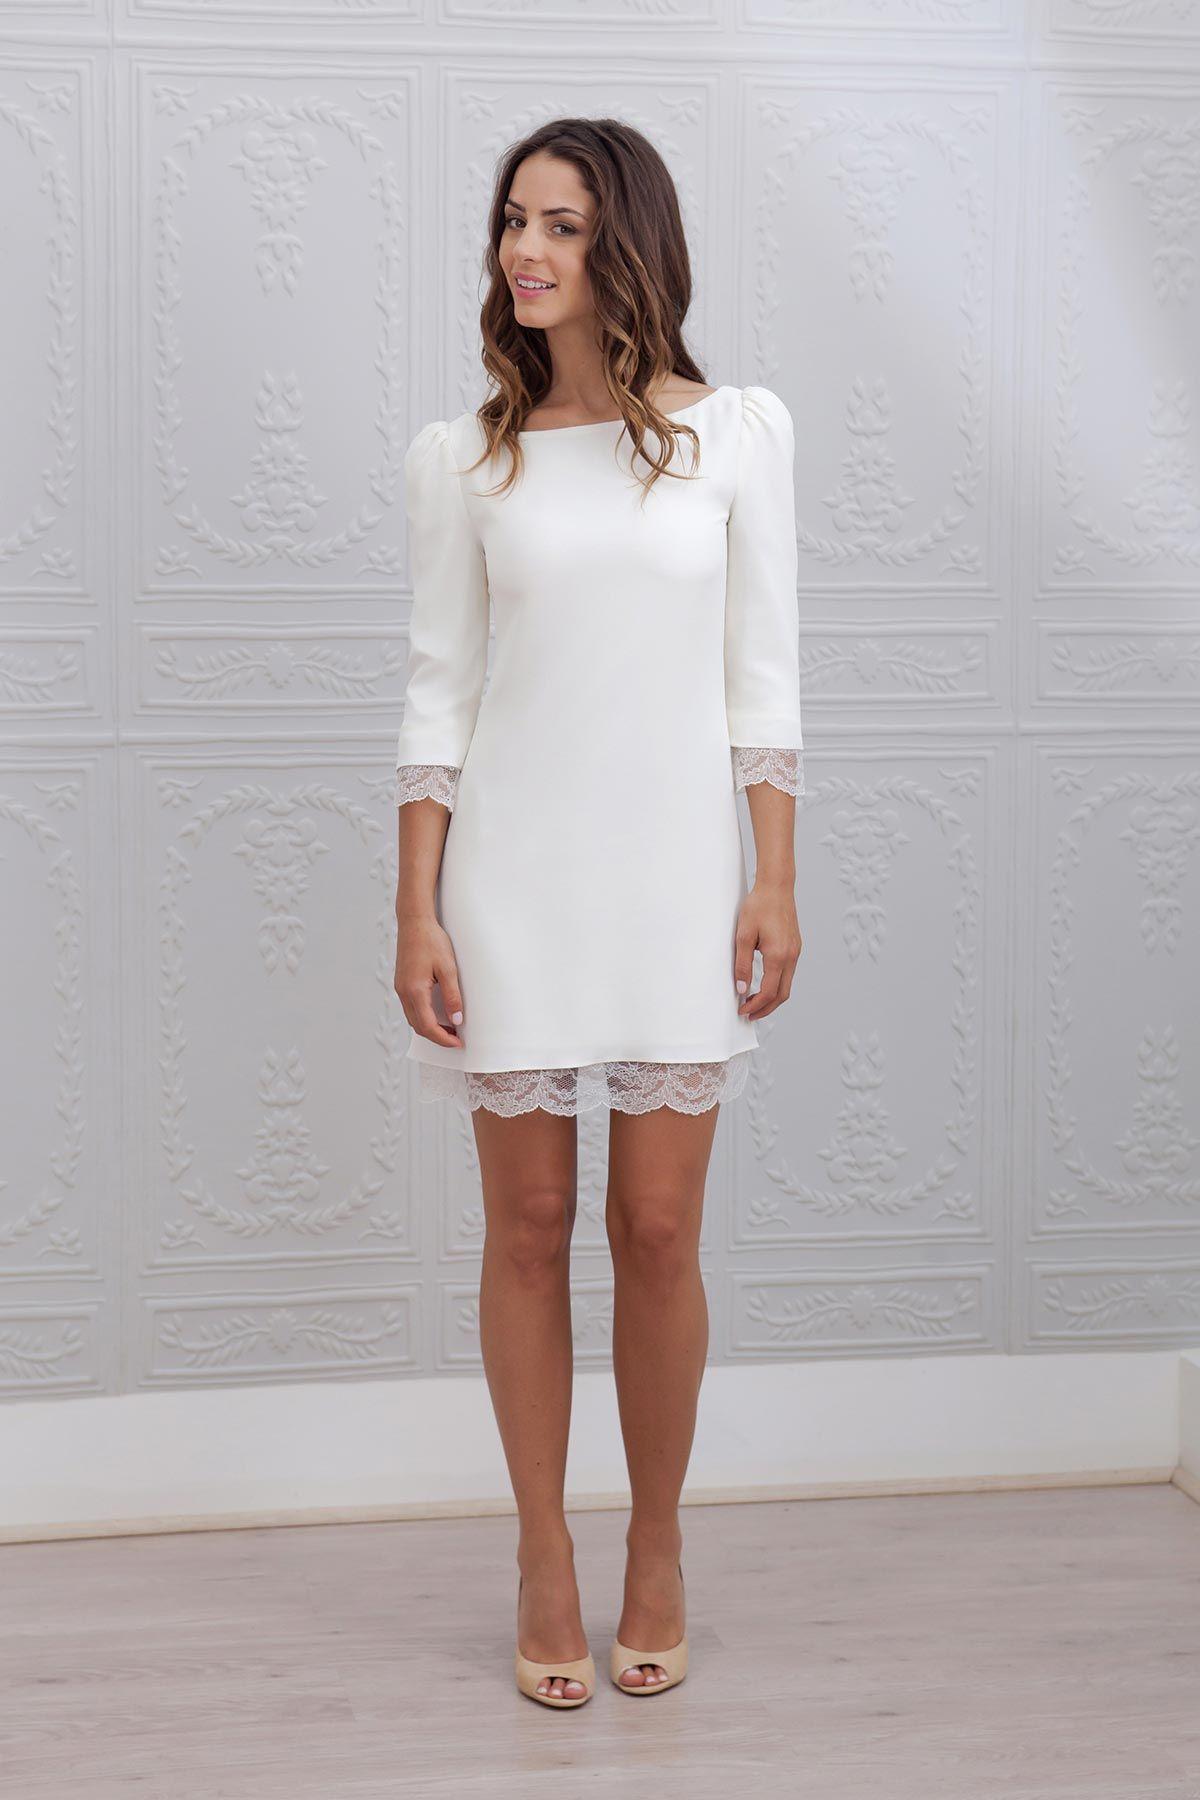 Robe de mariée courte , Marie Mathilde, modèle Margot bridaldress  robecourte shortweddingdress